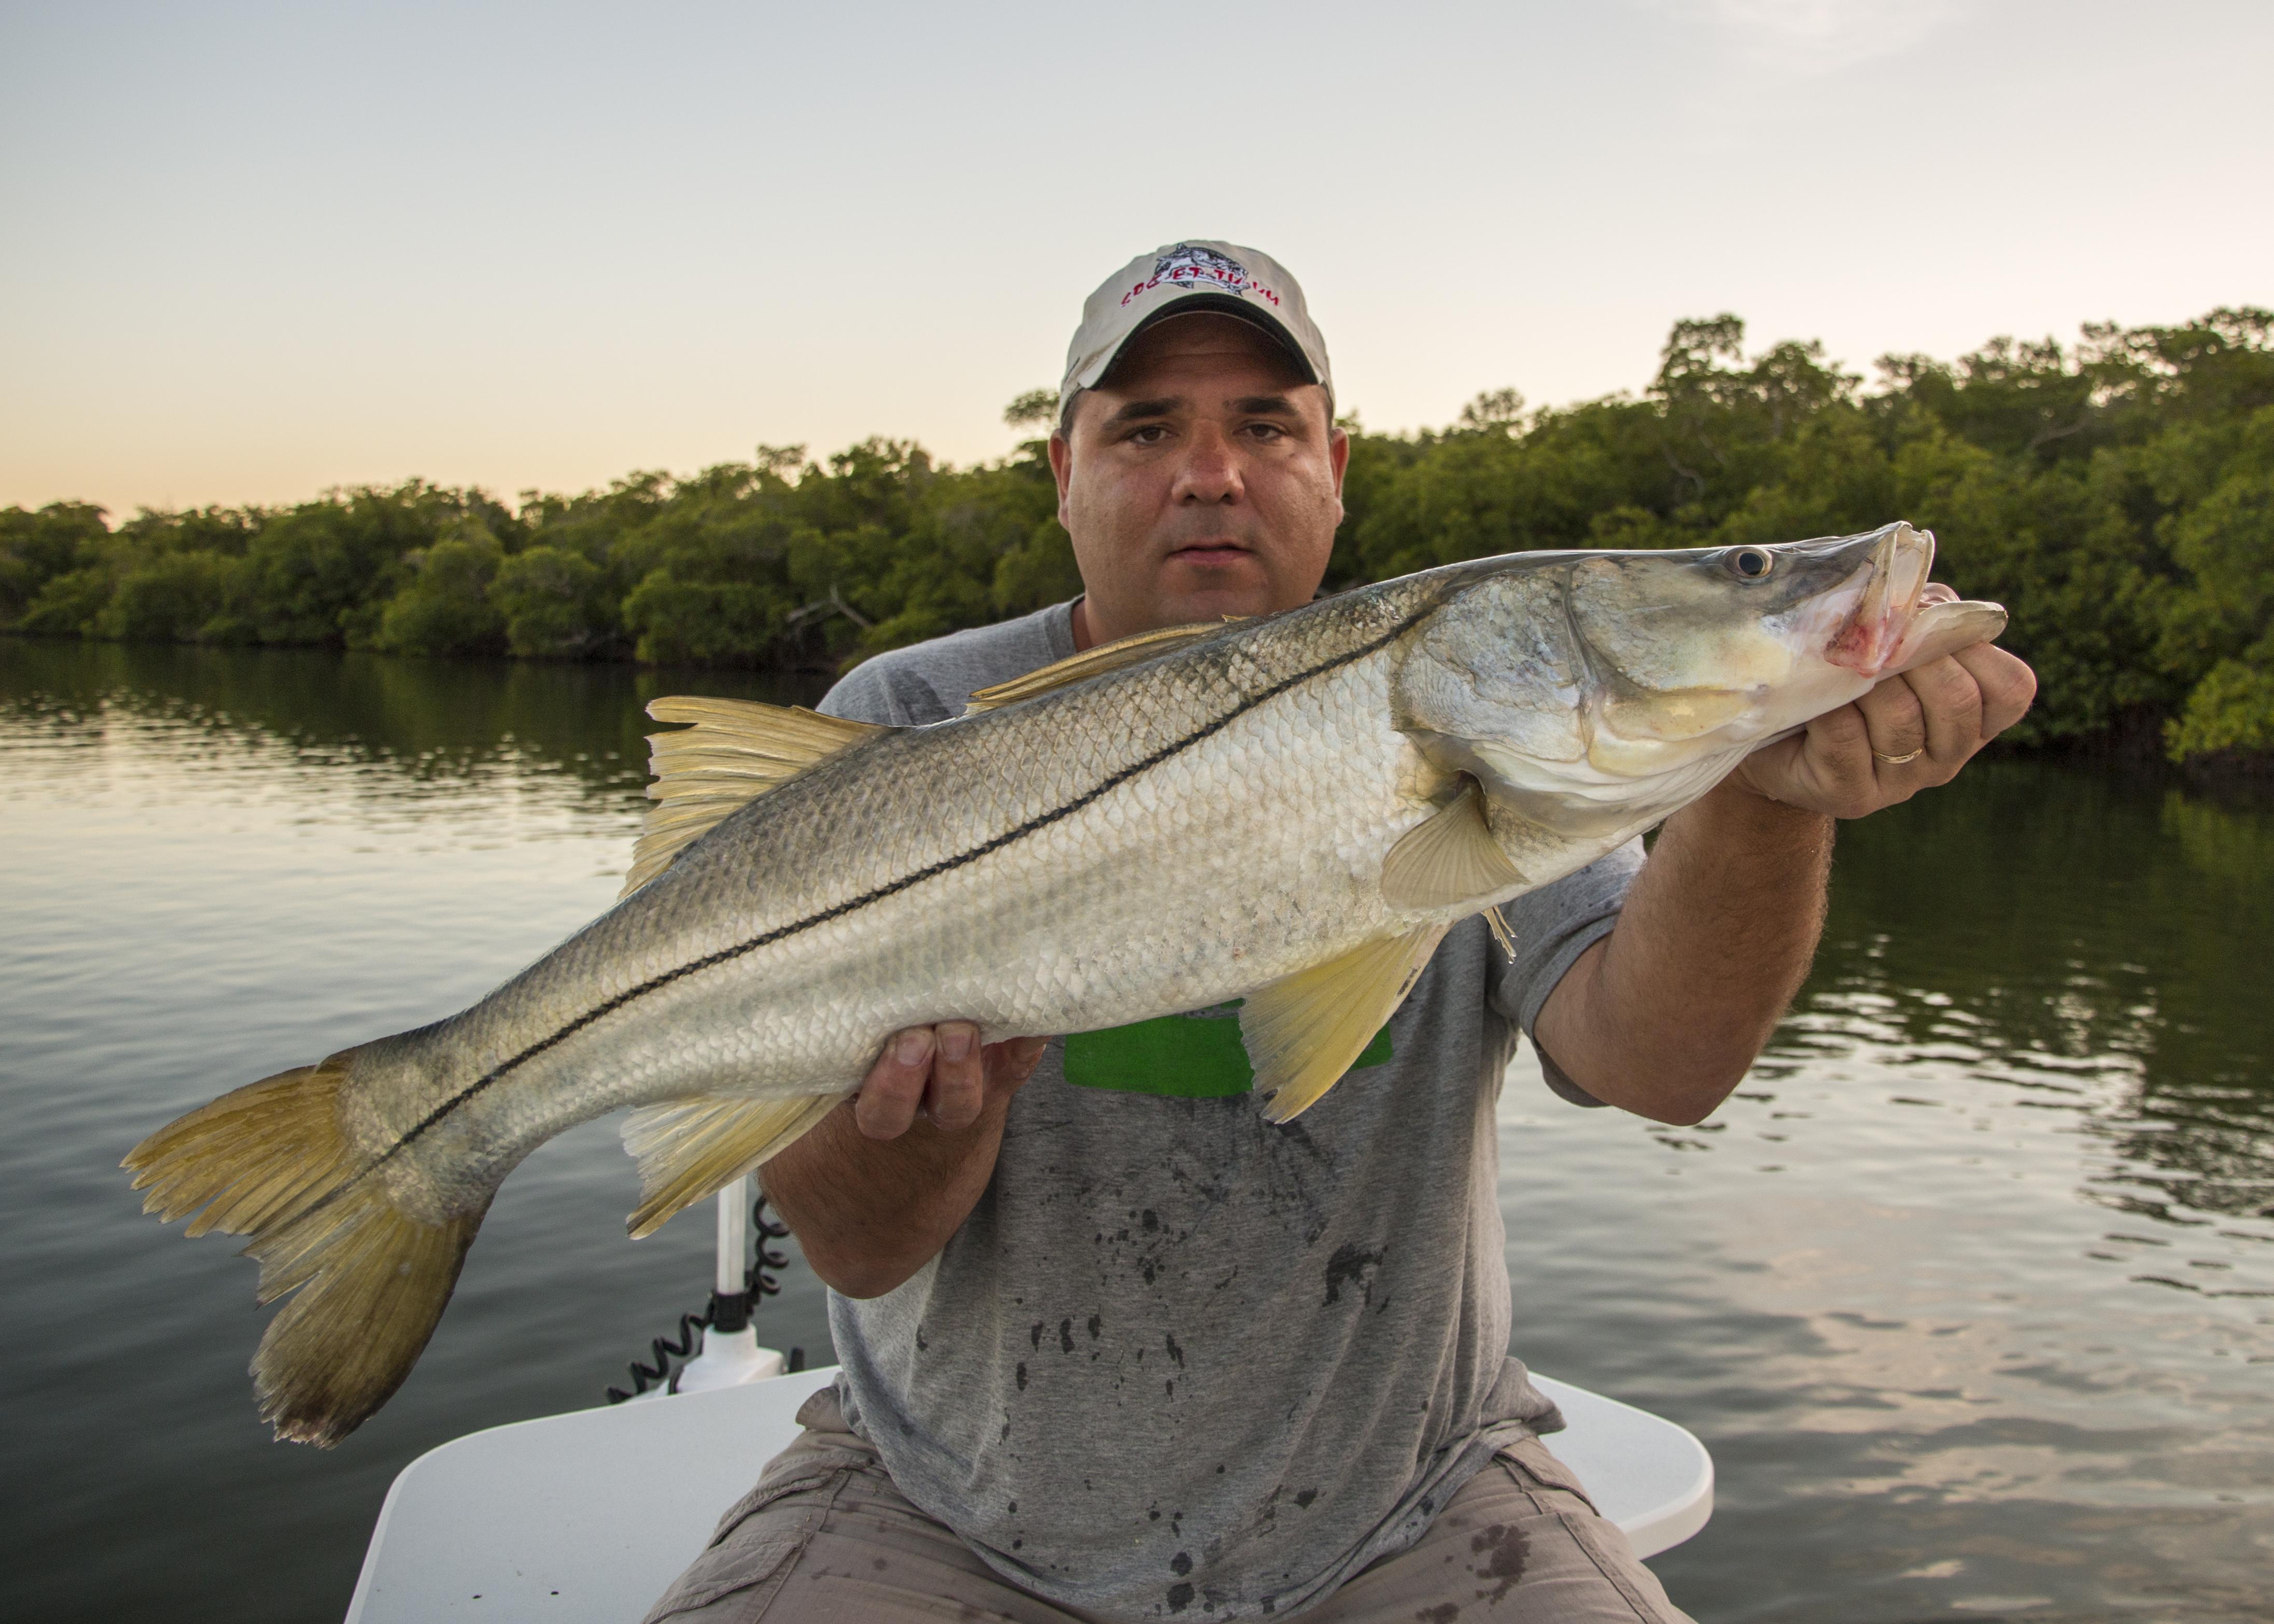 Awesome fishing on sanibel fishing charters sanibel for Fishing for snook